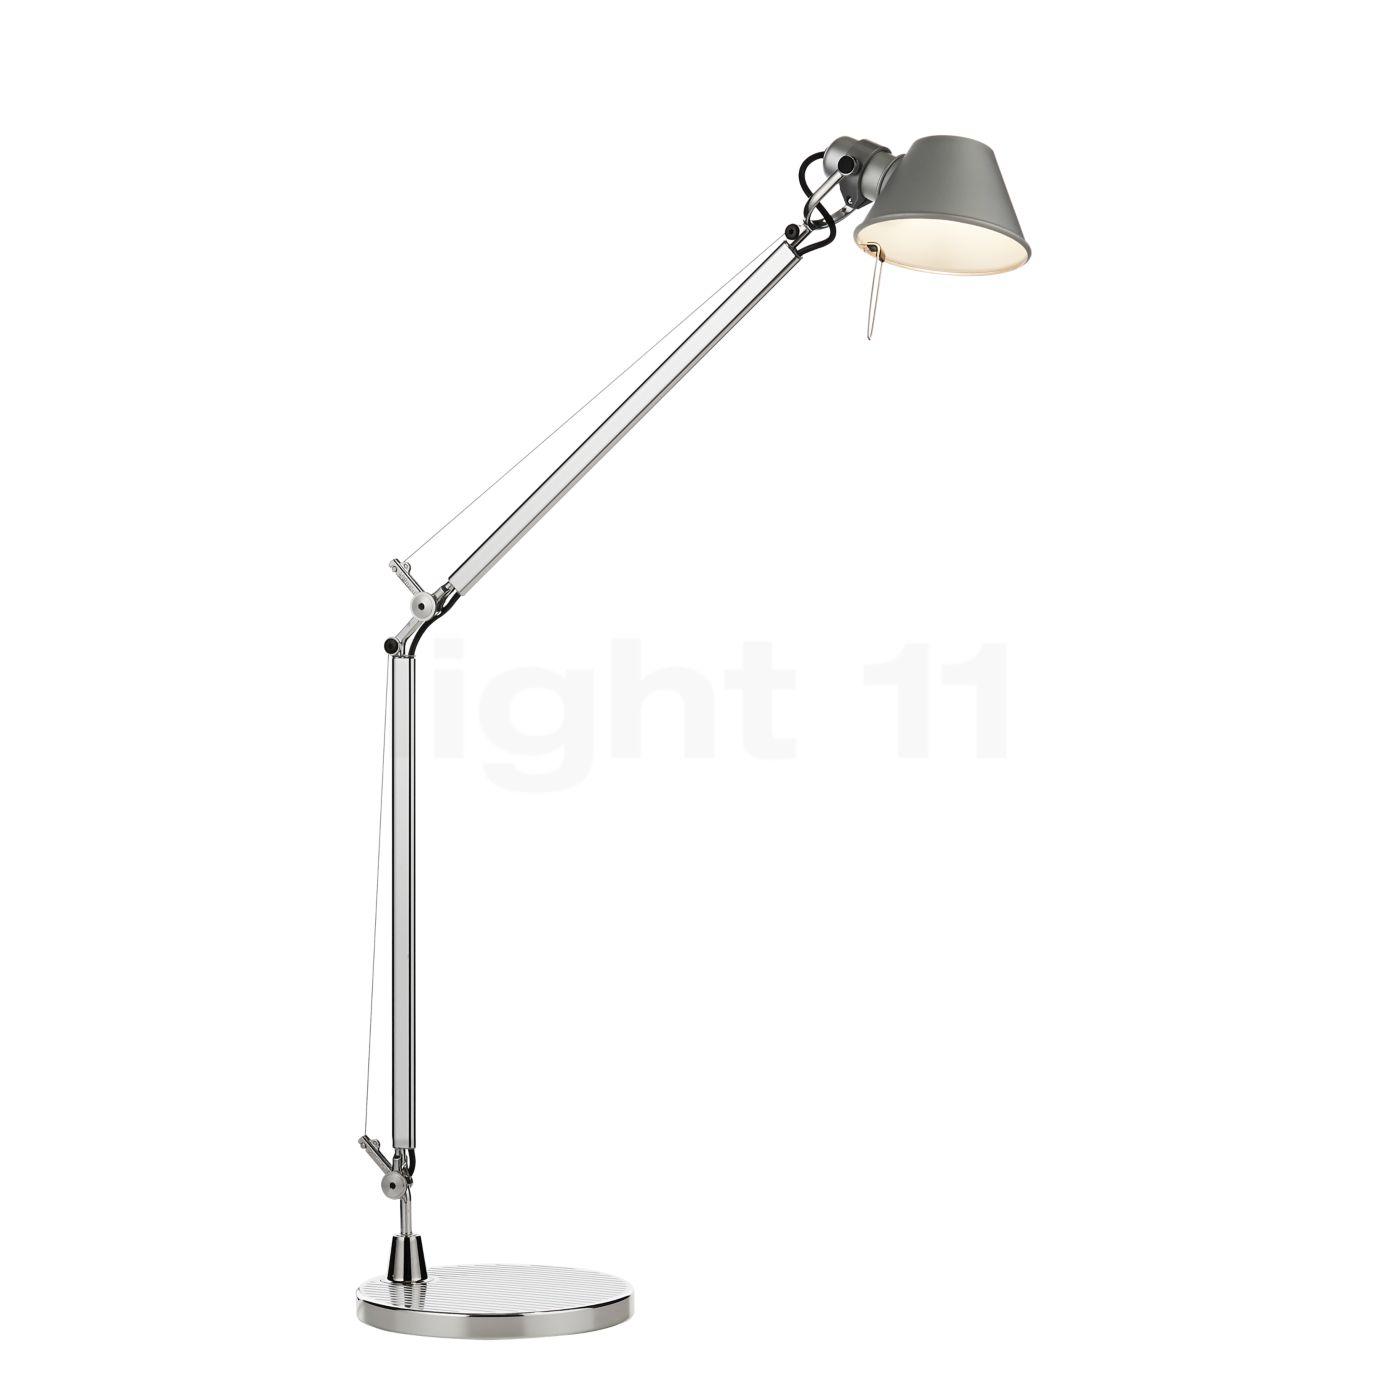 artemide tolomeo midi led table lamp buy at. Black Bedroom Furniture Sets. Home Design Ideas